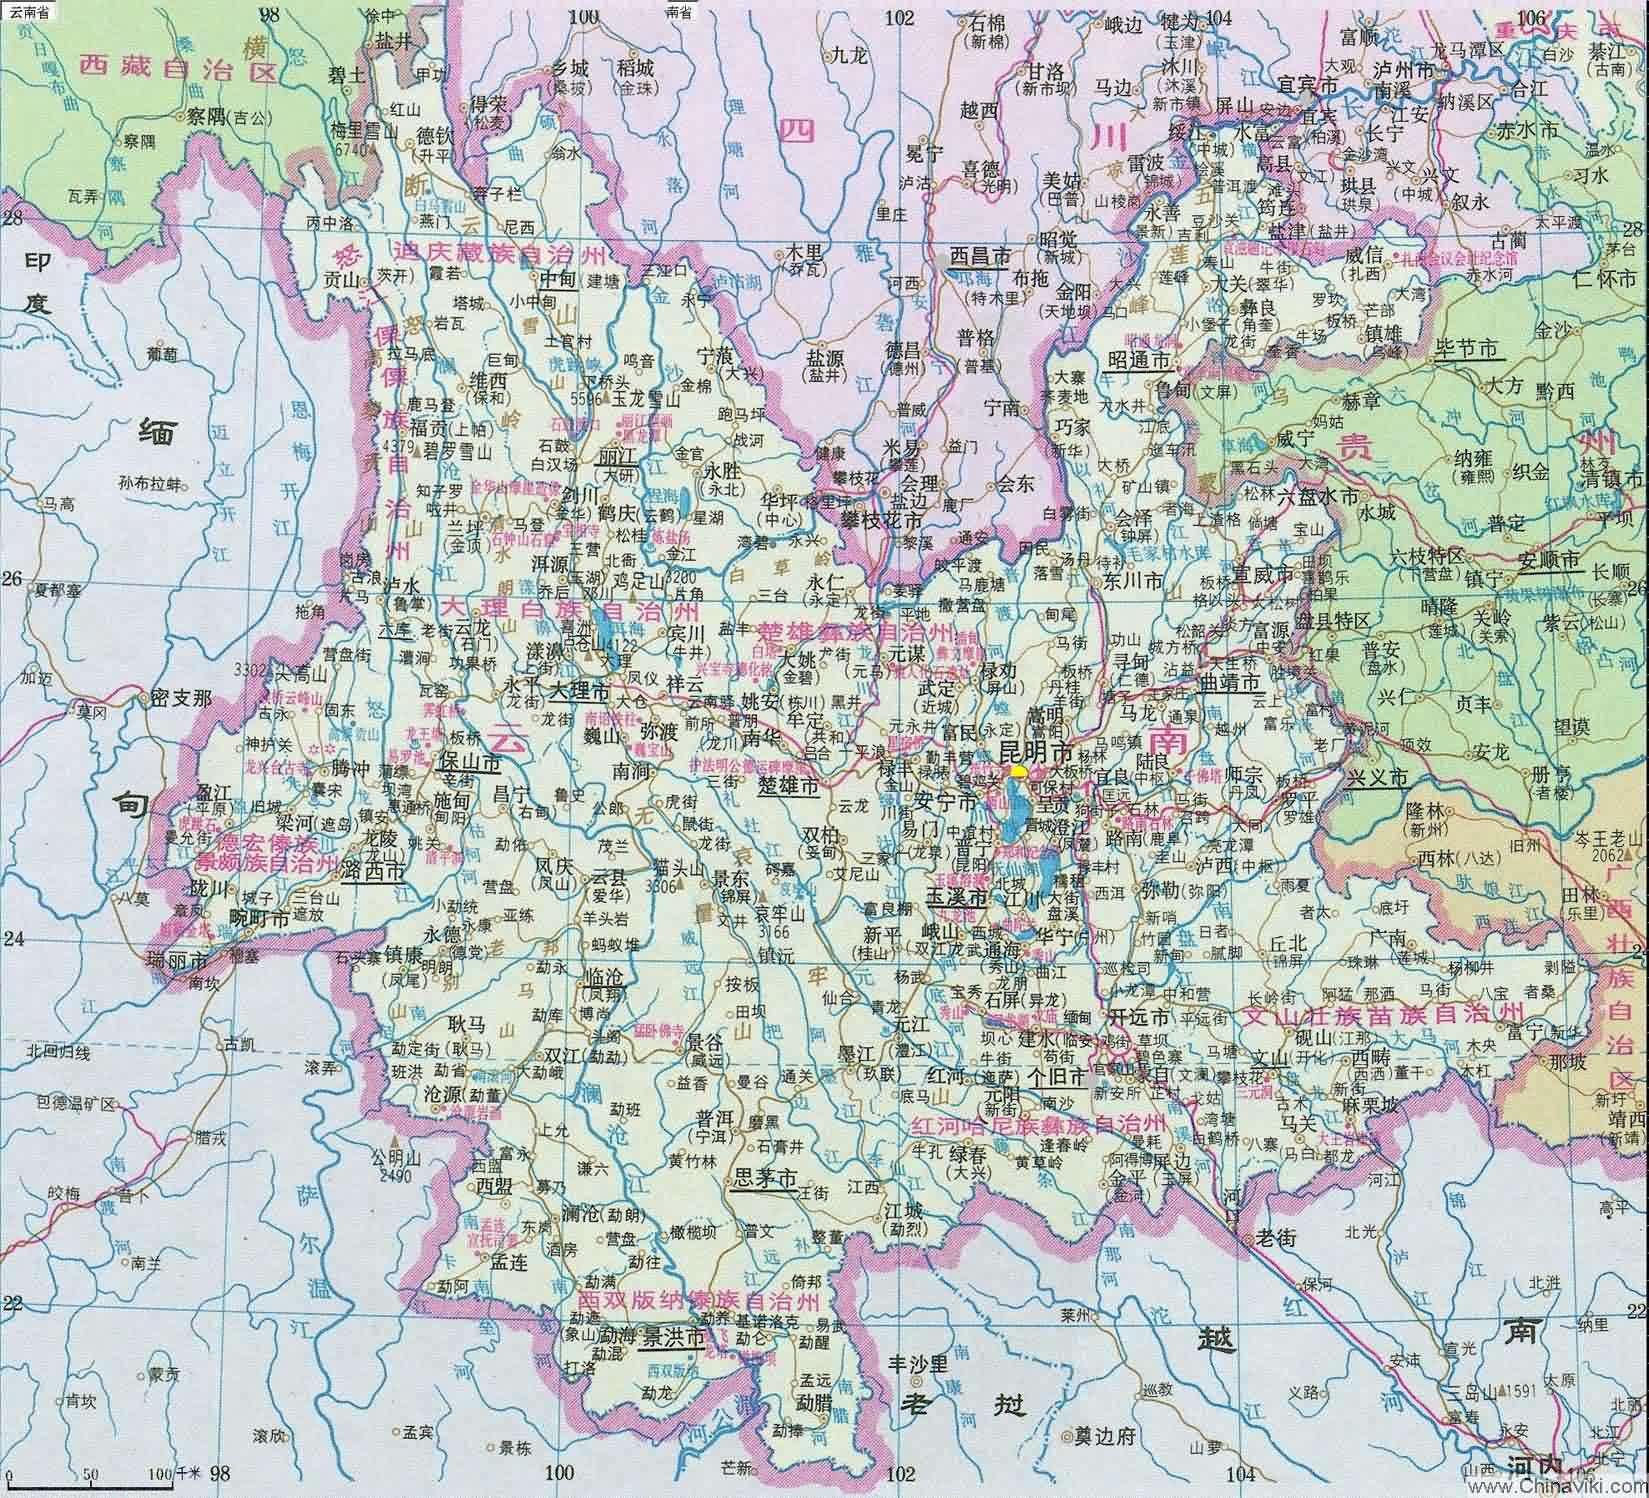 https://www.chinaviki.com/china-maps/img/big/yunnan.jpg